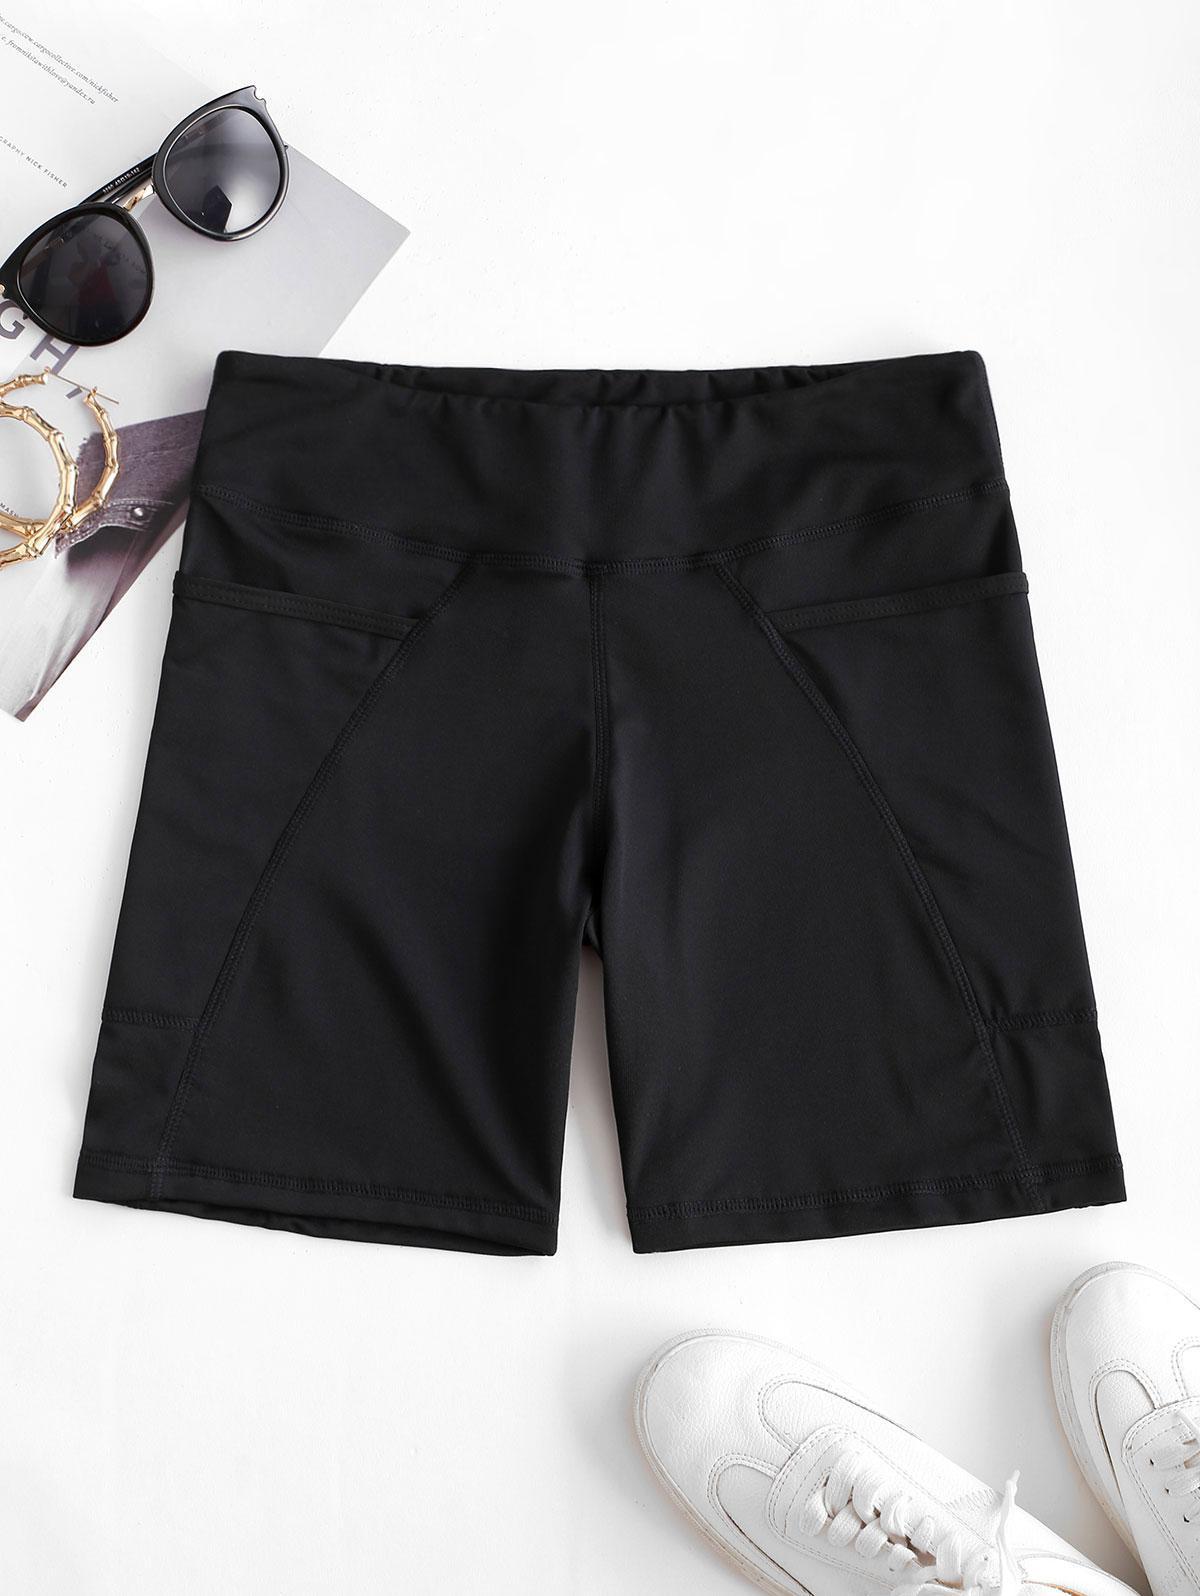 High Rise Pocket Stretchy Biker Shorts